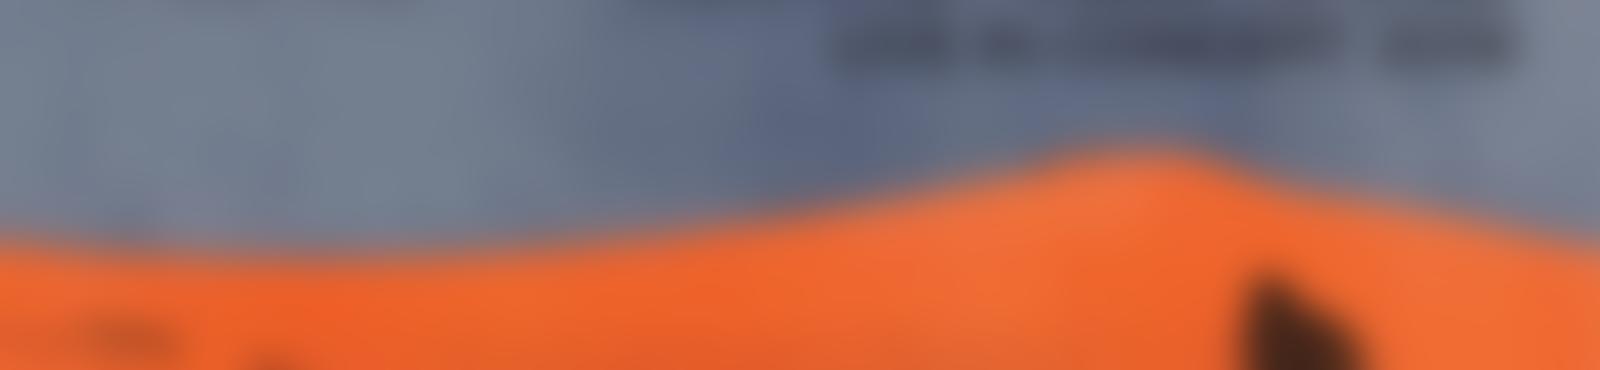 Blurred 0ffb164c 9785 42ed 8fe7 c8500a97e3f1